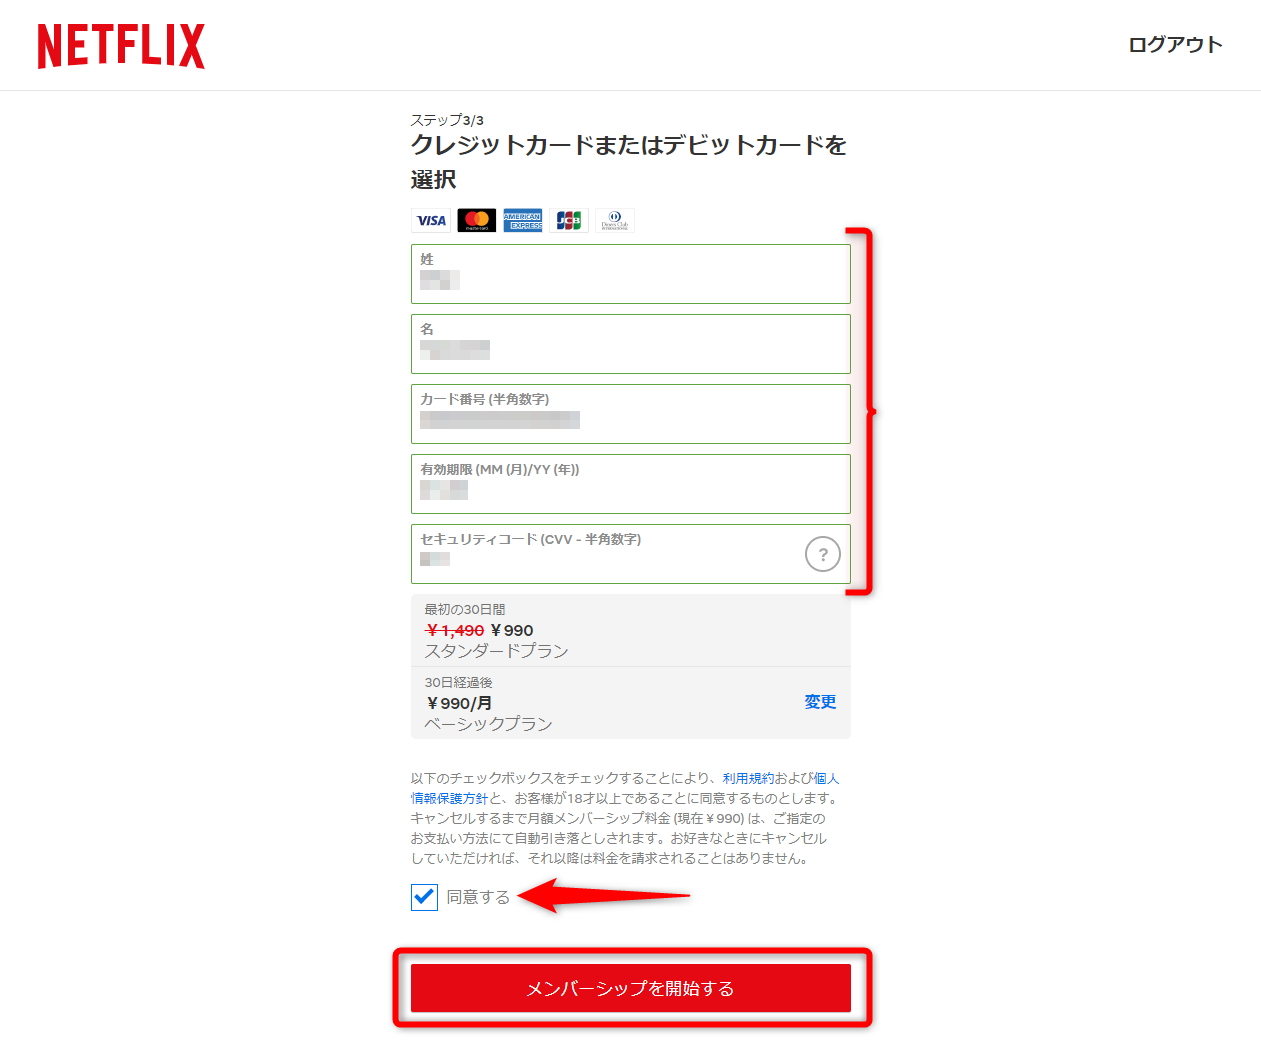 Netflix(ネットフリックス)の登録方法。プランの違いやおすすめ機能も解説